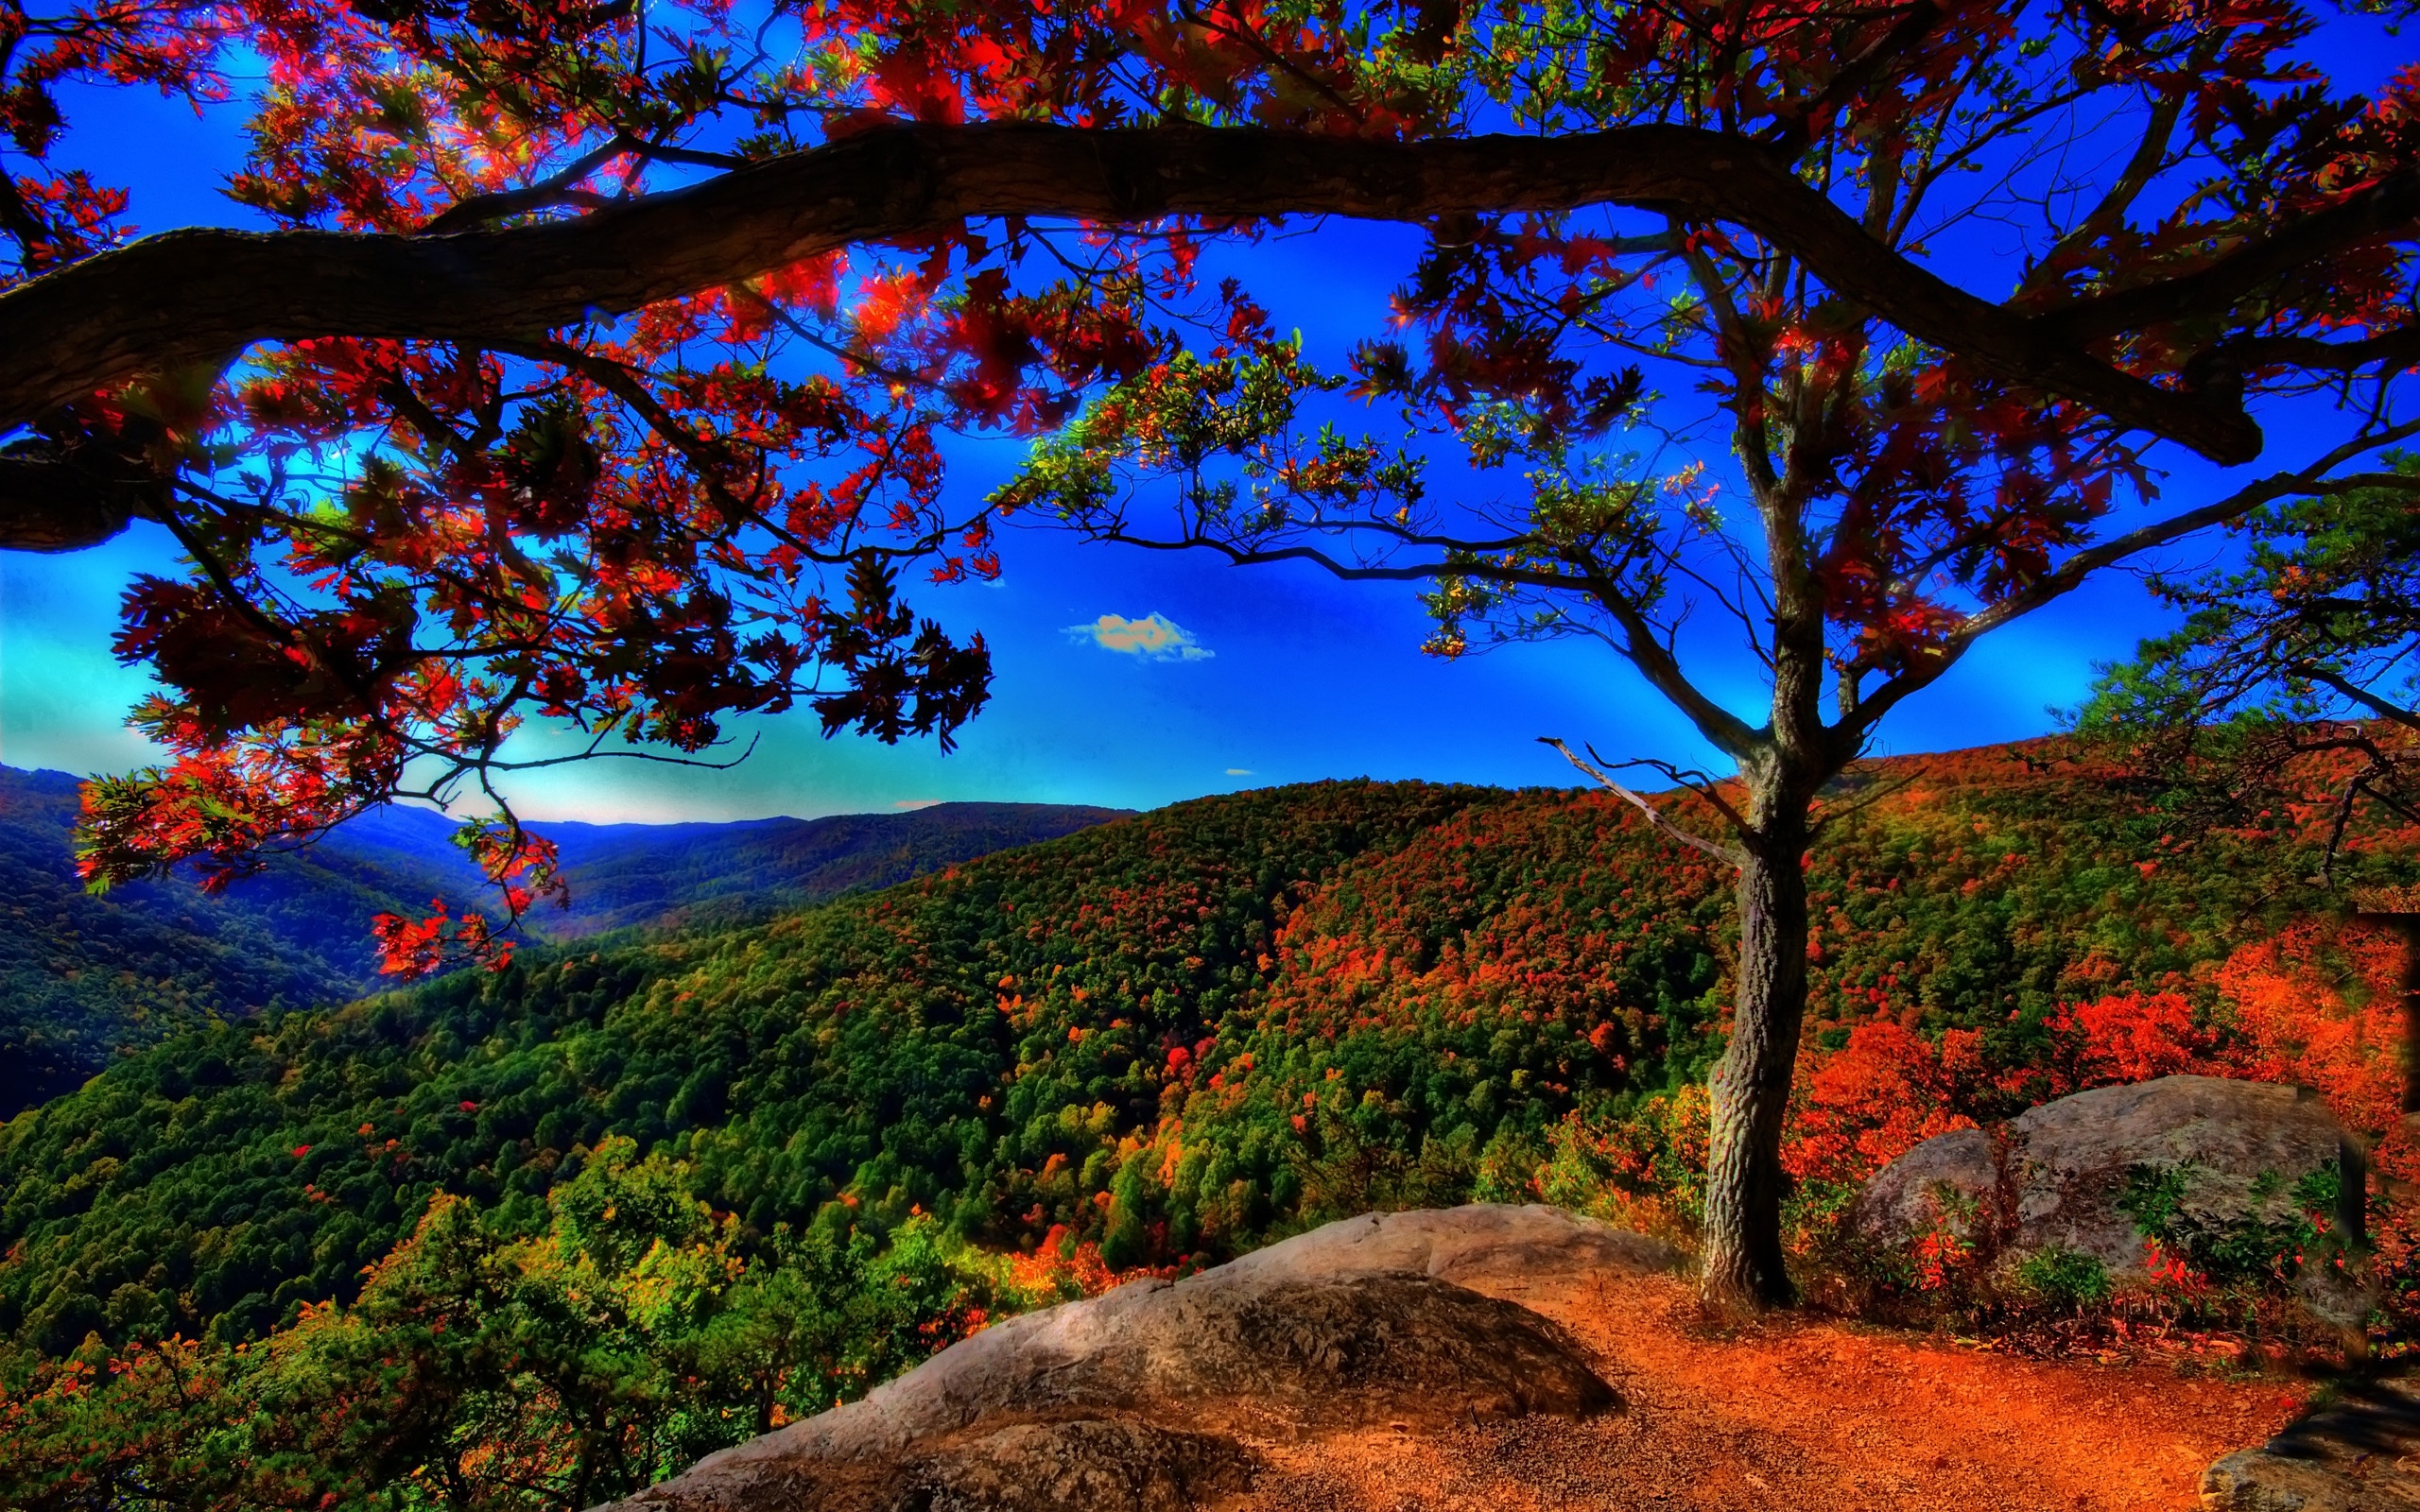 autumn-free-wallpaper-autumn-landscape ?